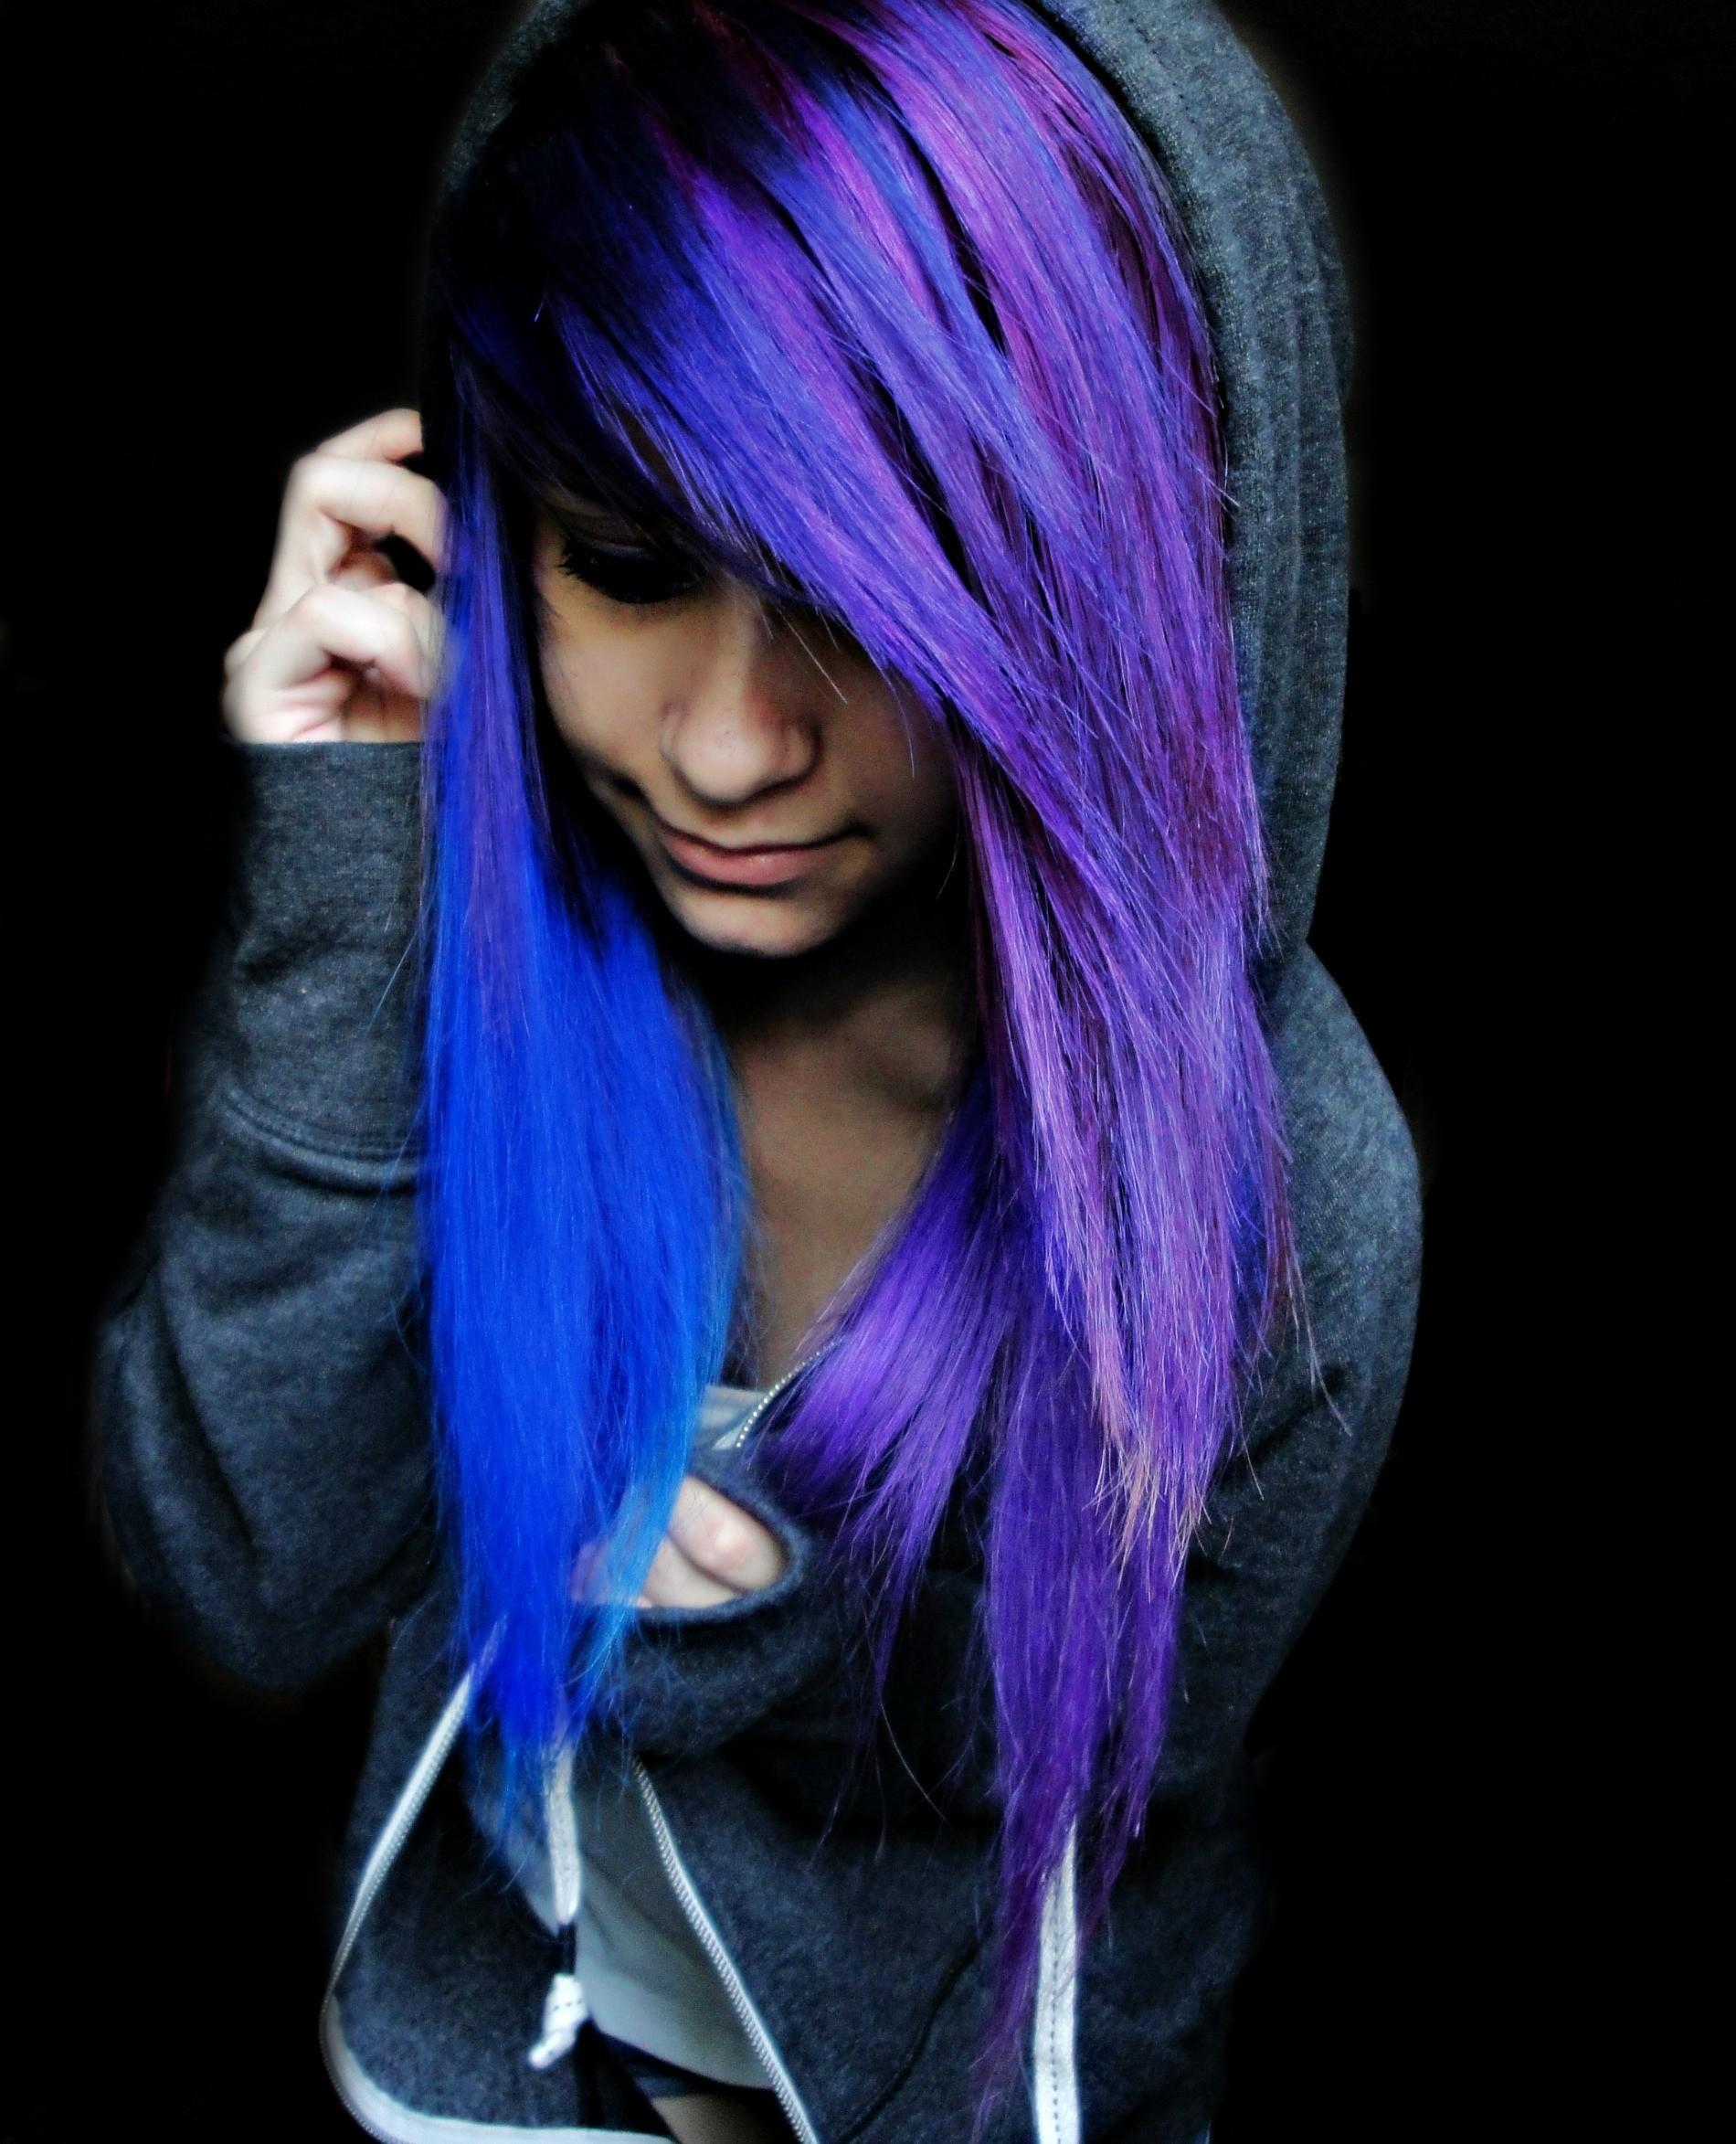 emo and scene girls | Scene-girl-emo-and-scene-hairstyles